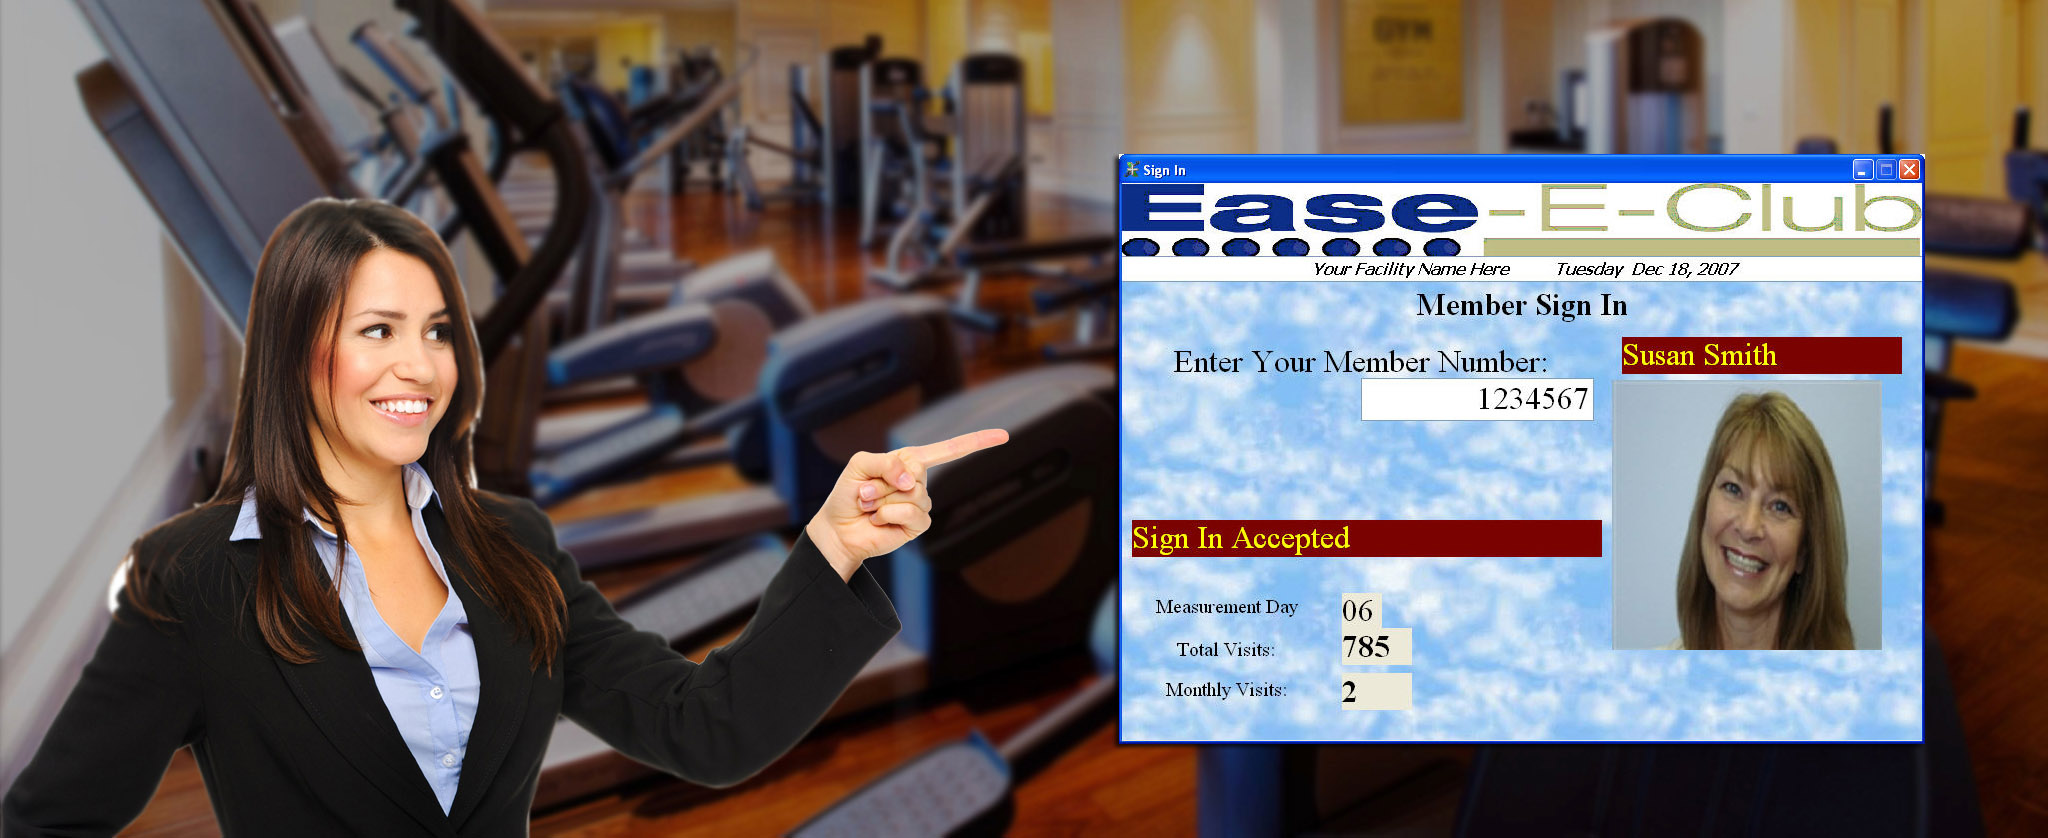 http://www.fitnessclubsoftware.com/wp-content/uploads/2016/09/Gym6.jpg